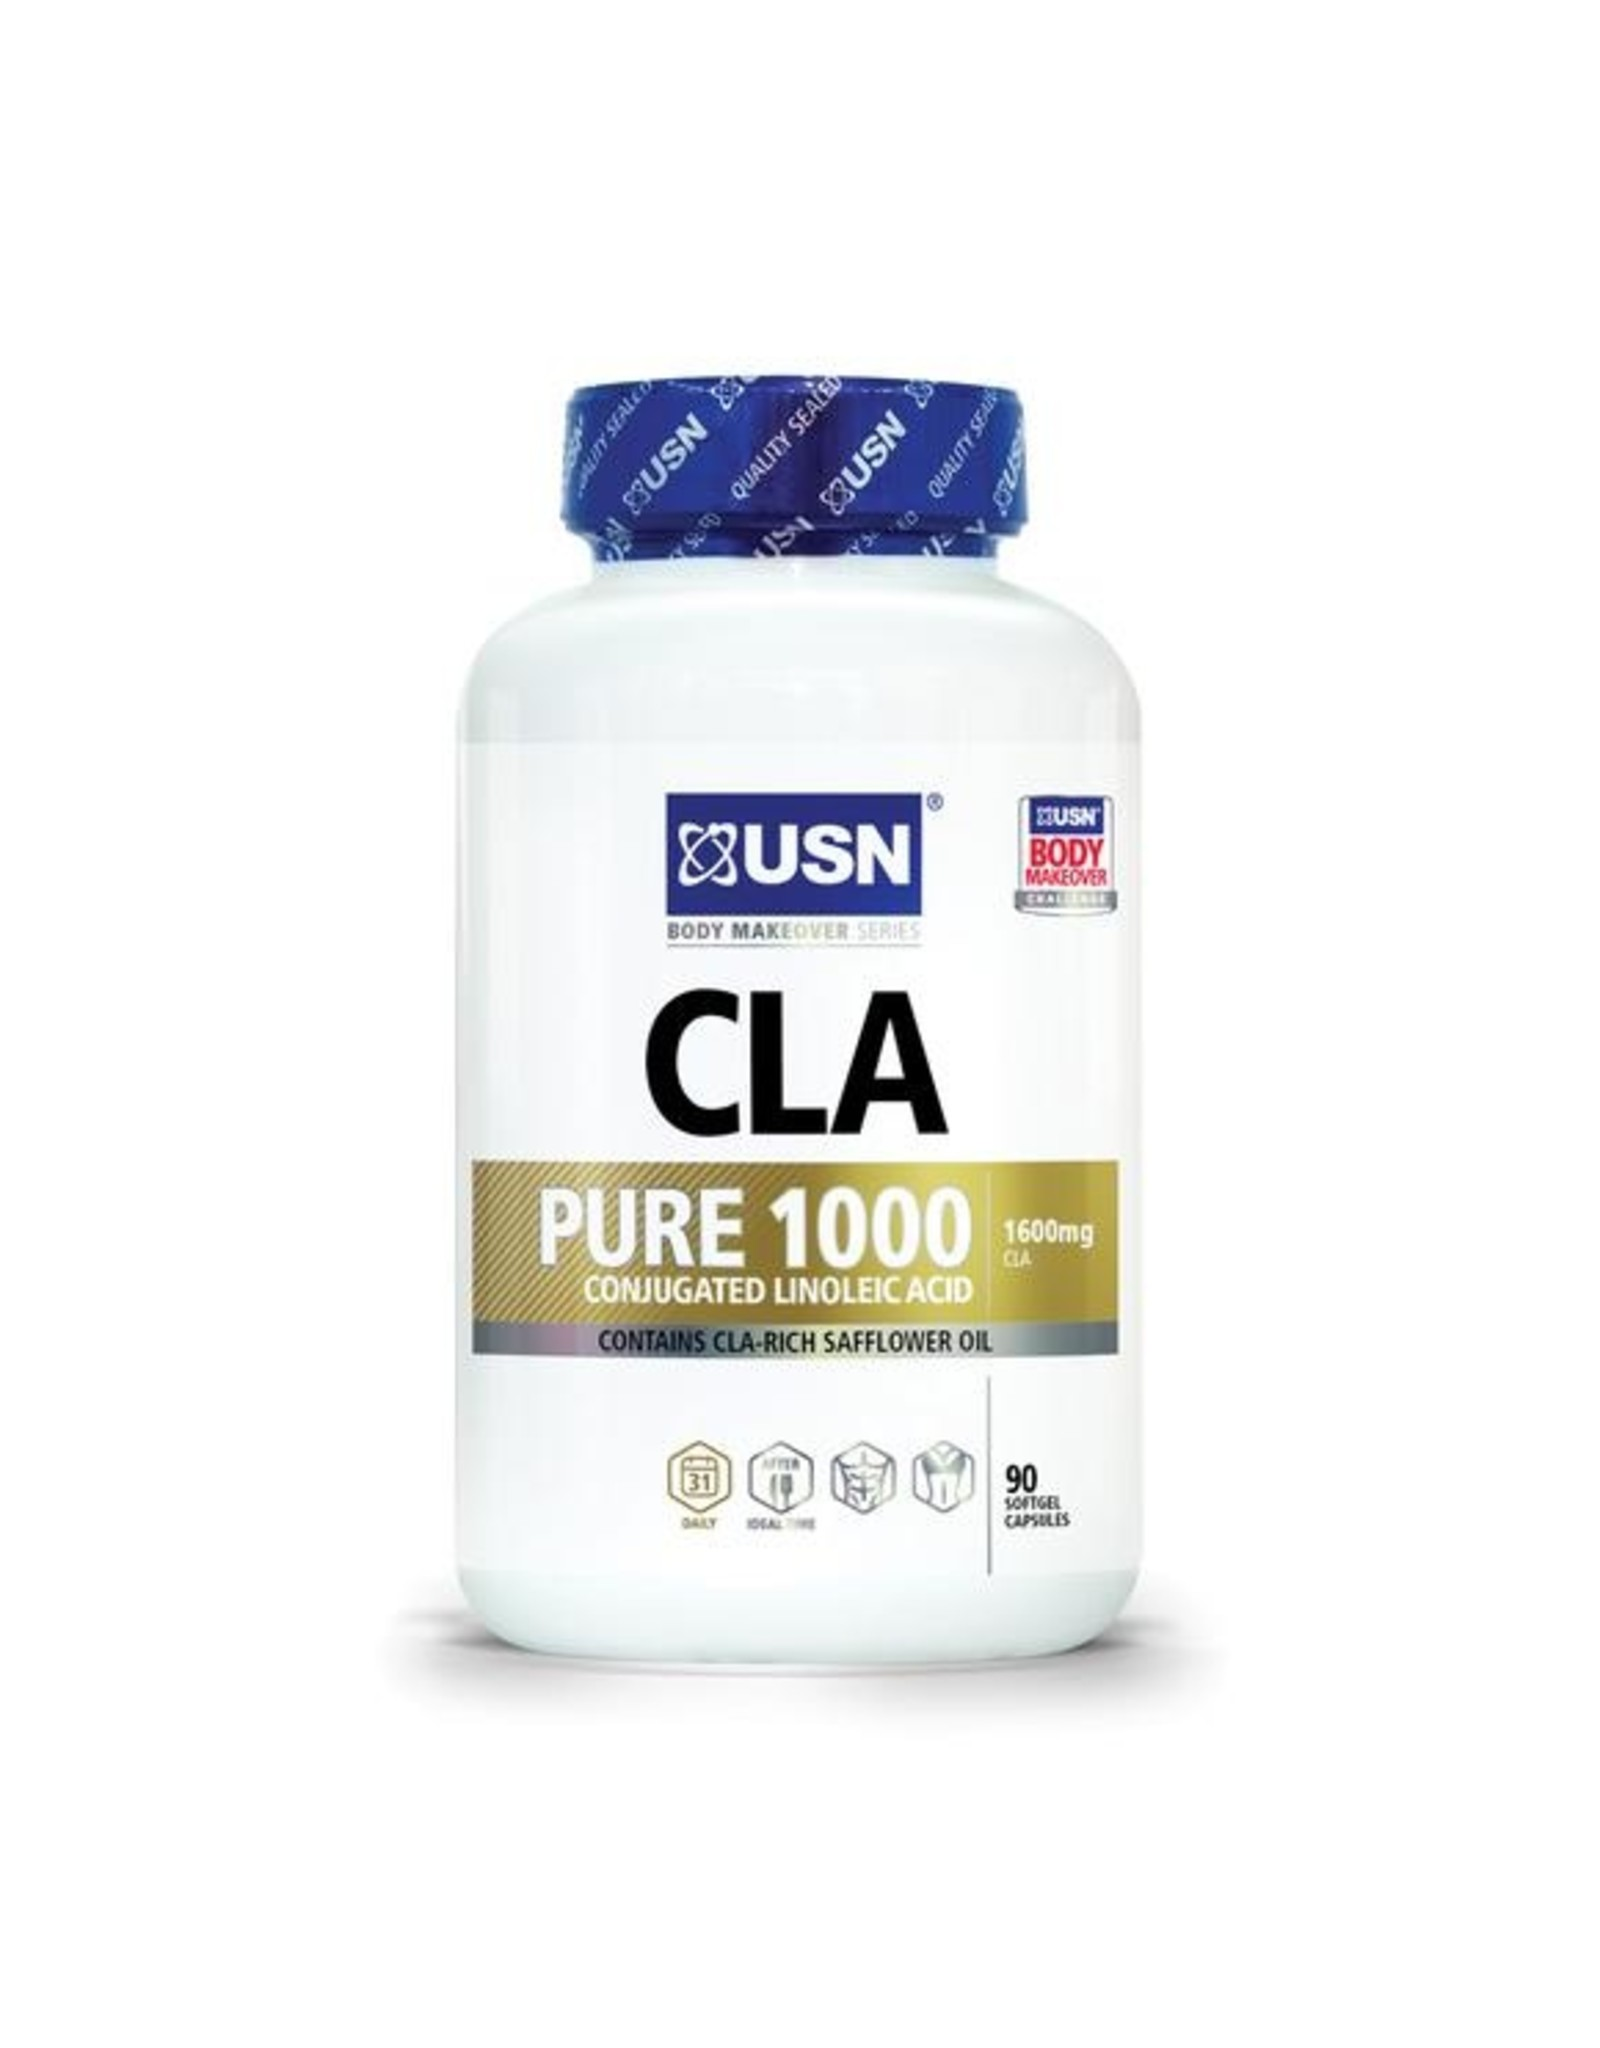 USN USN CLA PURE 1000